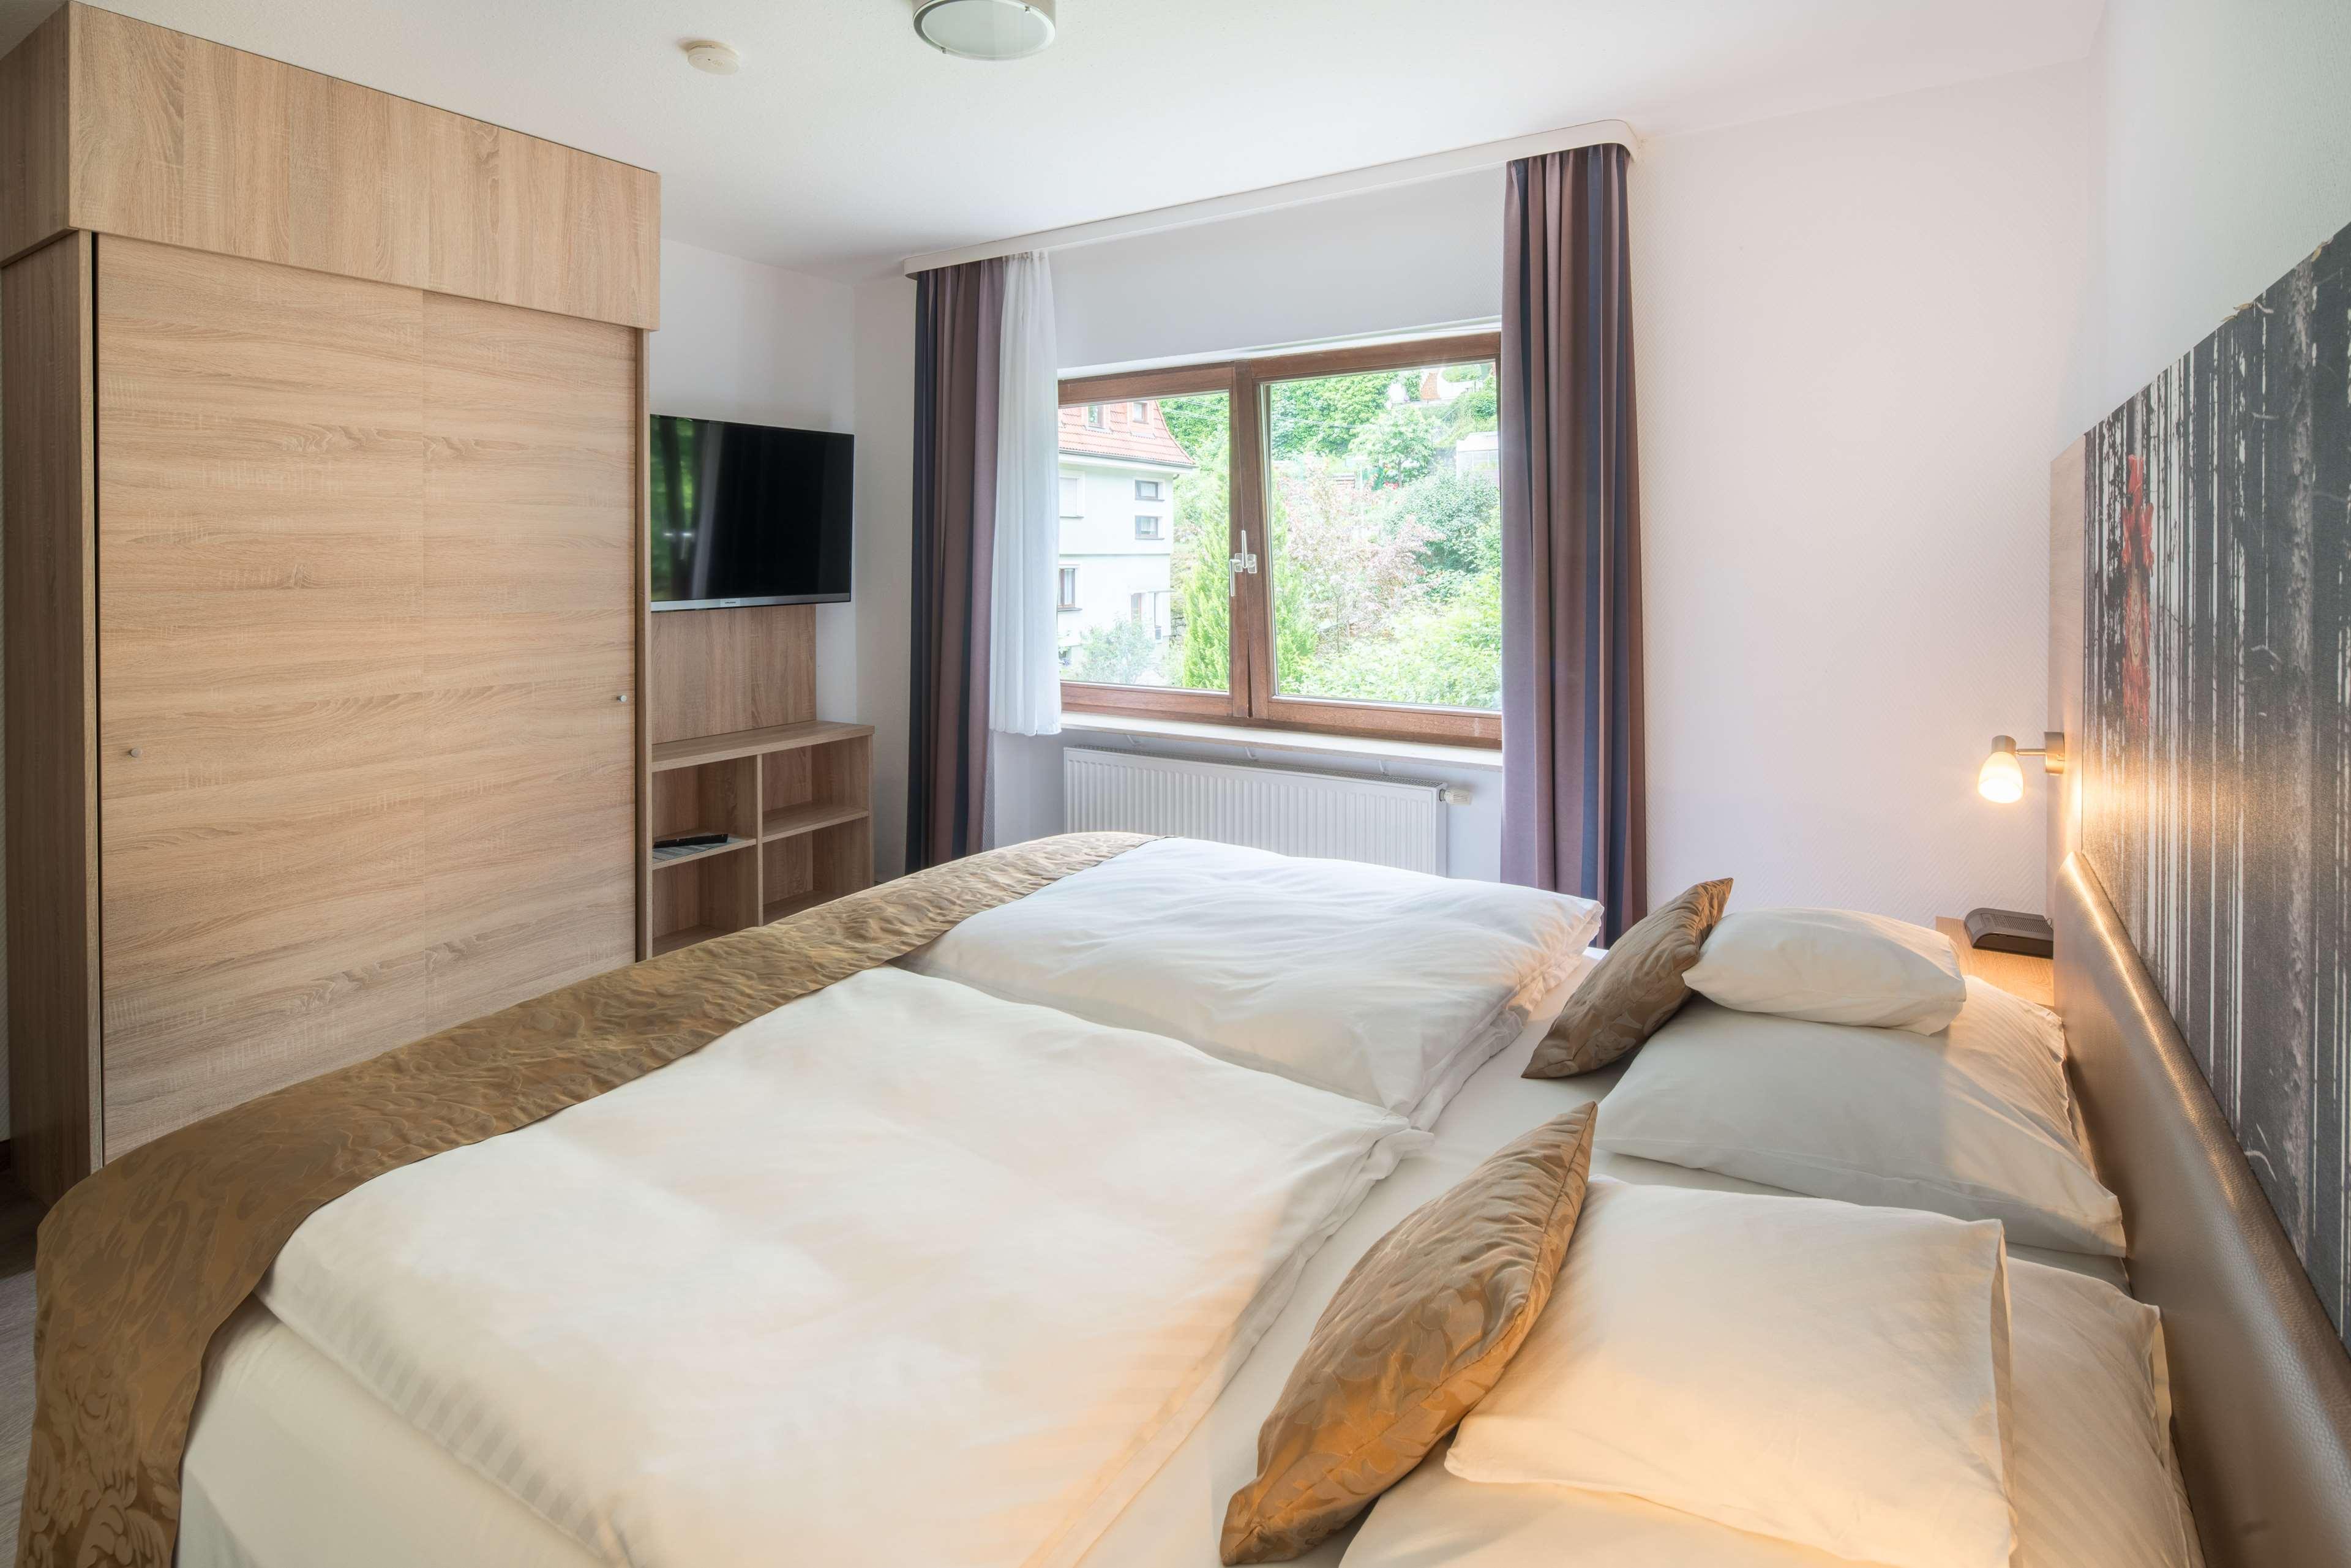 Best western plus hotel schwarzwald residenz hotels for Schwarzwald design hotel